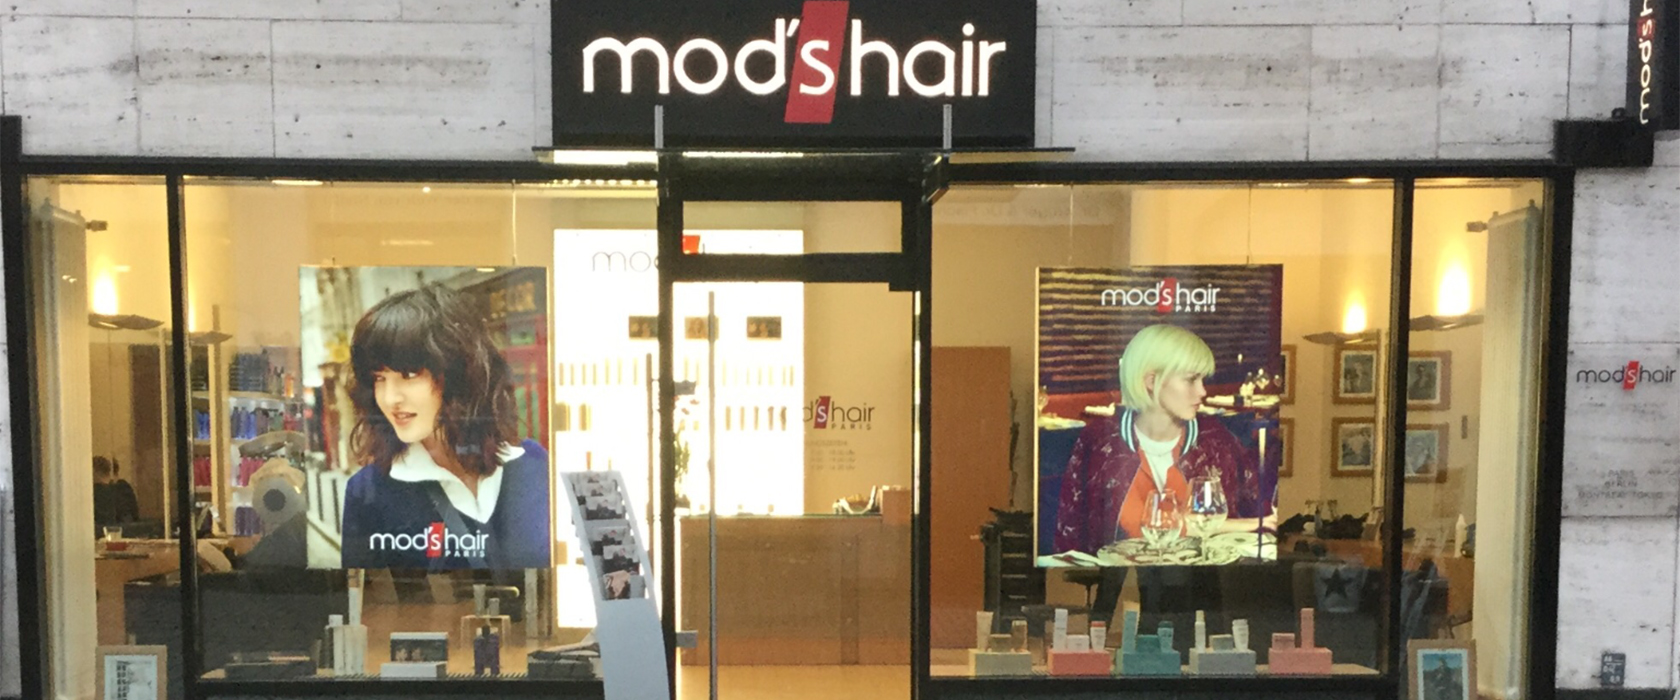 Ihr Friseursalon in Bielefeld - Mod\'s Hair in Bielefeld